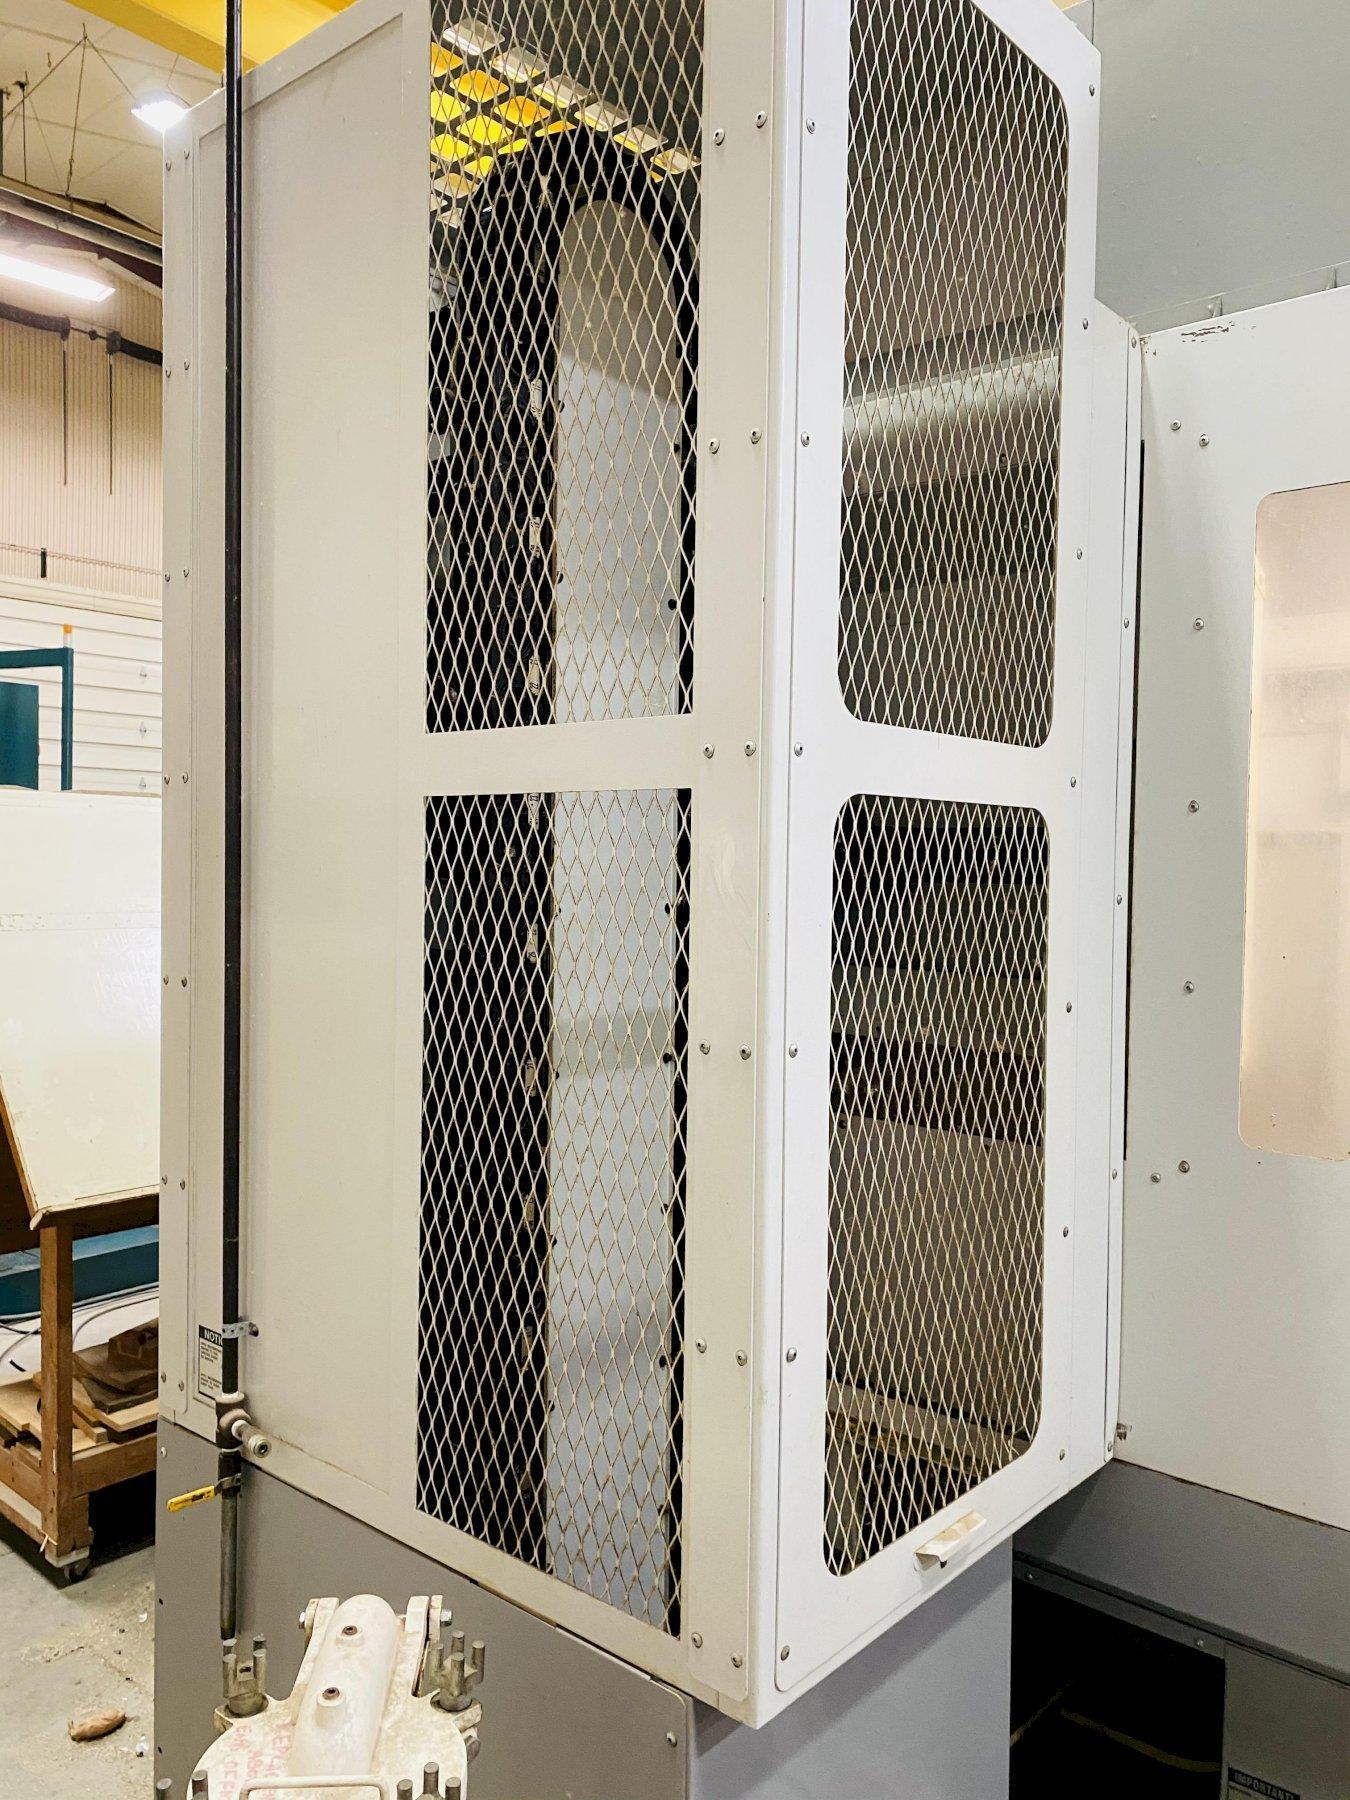 HAAS HS 2RP HORIZONTAL MACHINING CENTER. STOCK # 0104721